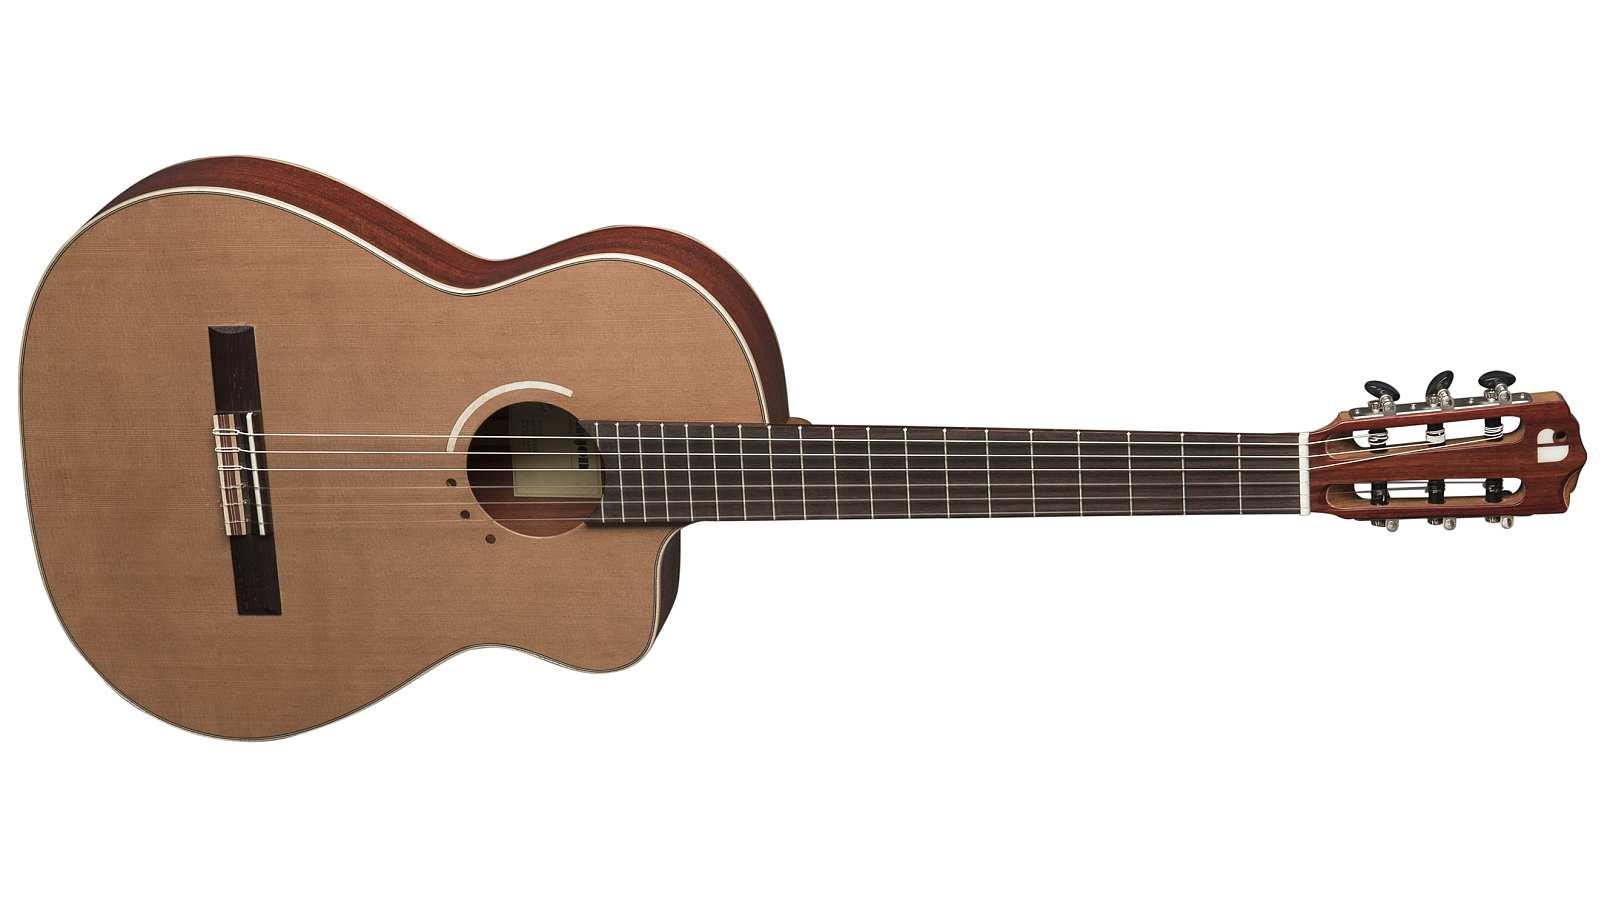 Aragon AF-S635CECE Silver Line Konzertgitarre